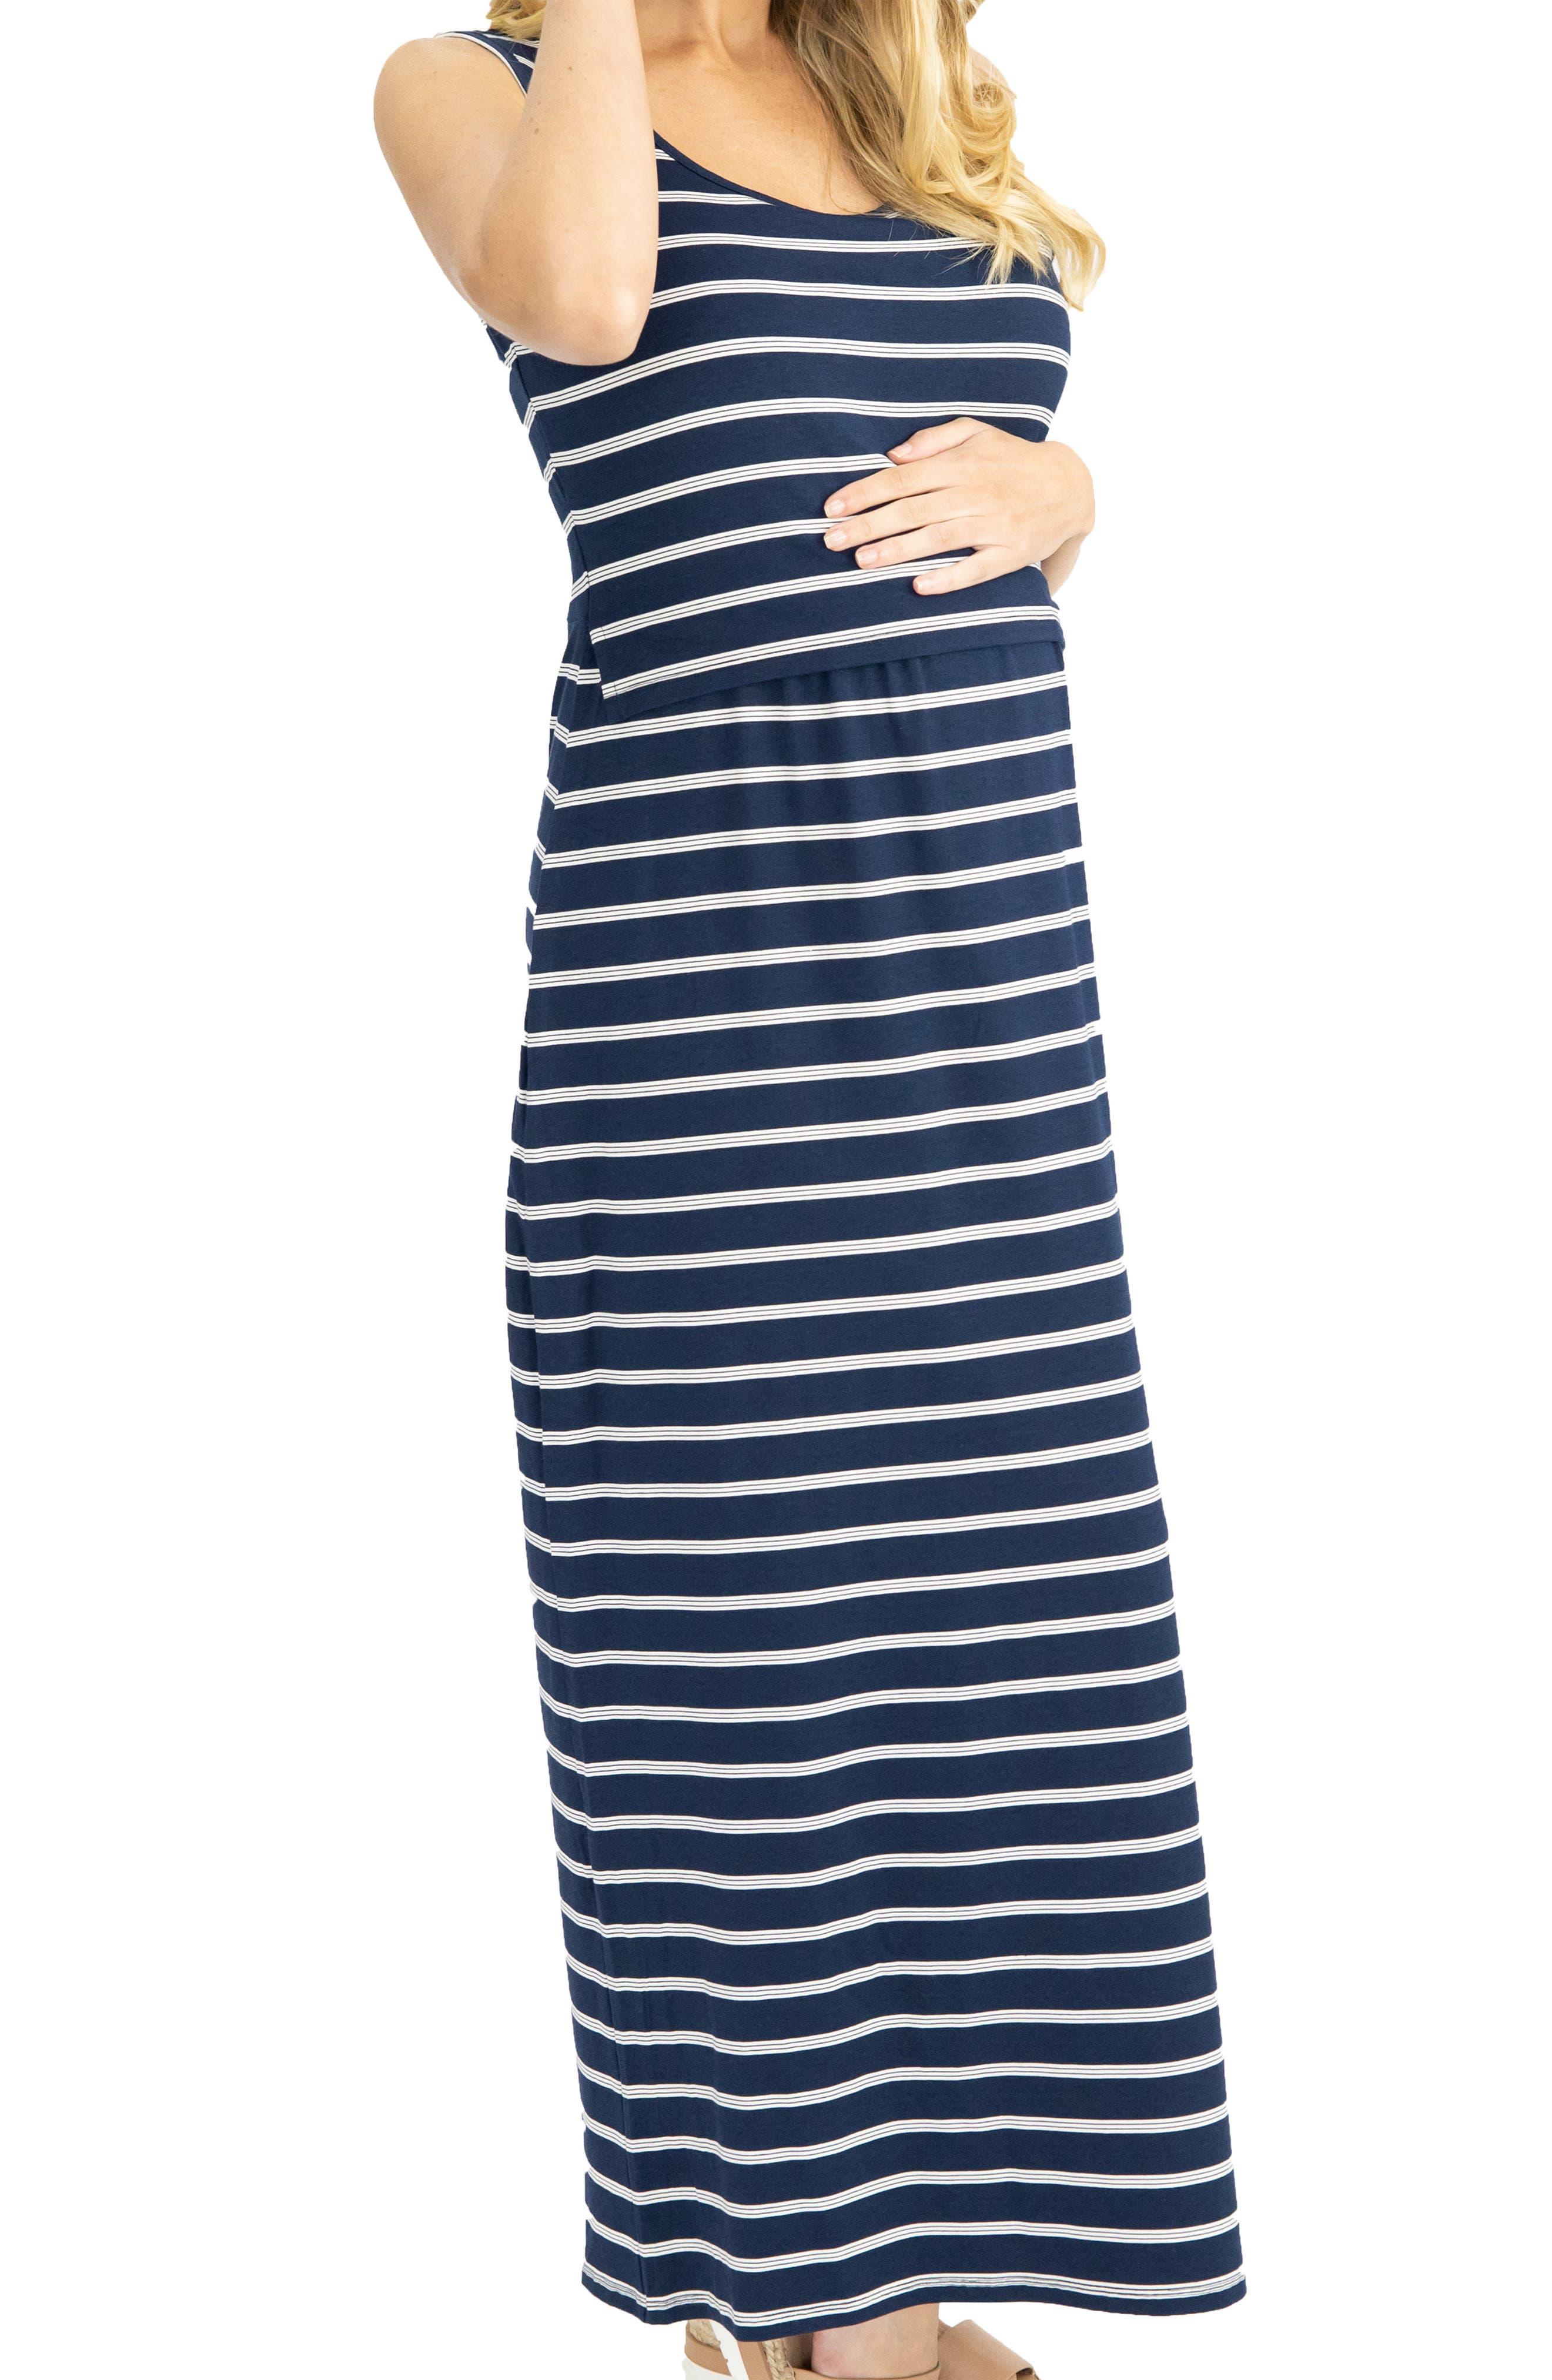 Busy Mama Maternity/nursing Maxi Dress